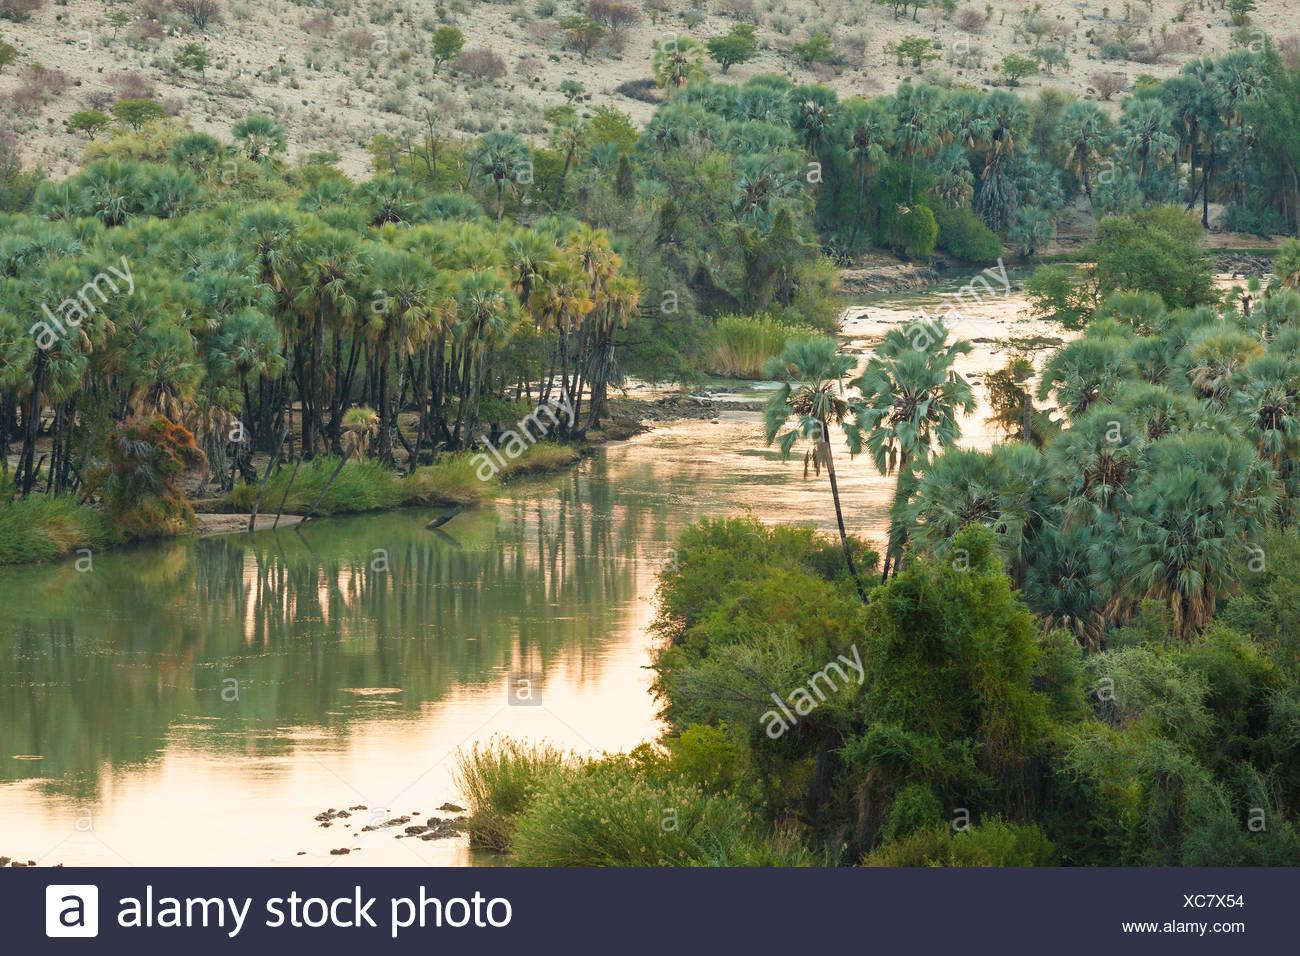 Kunene border river between Namibia and Angola, in the morning light, Kunene Region, Namibia - Stock Image